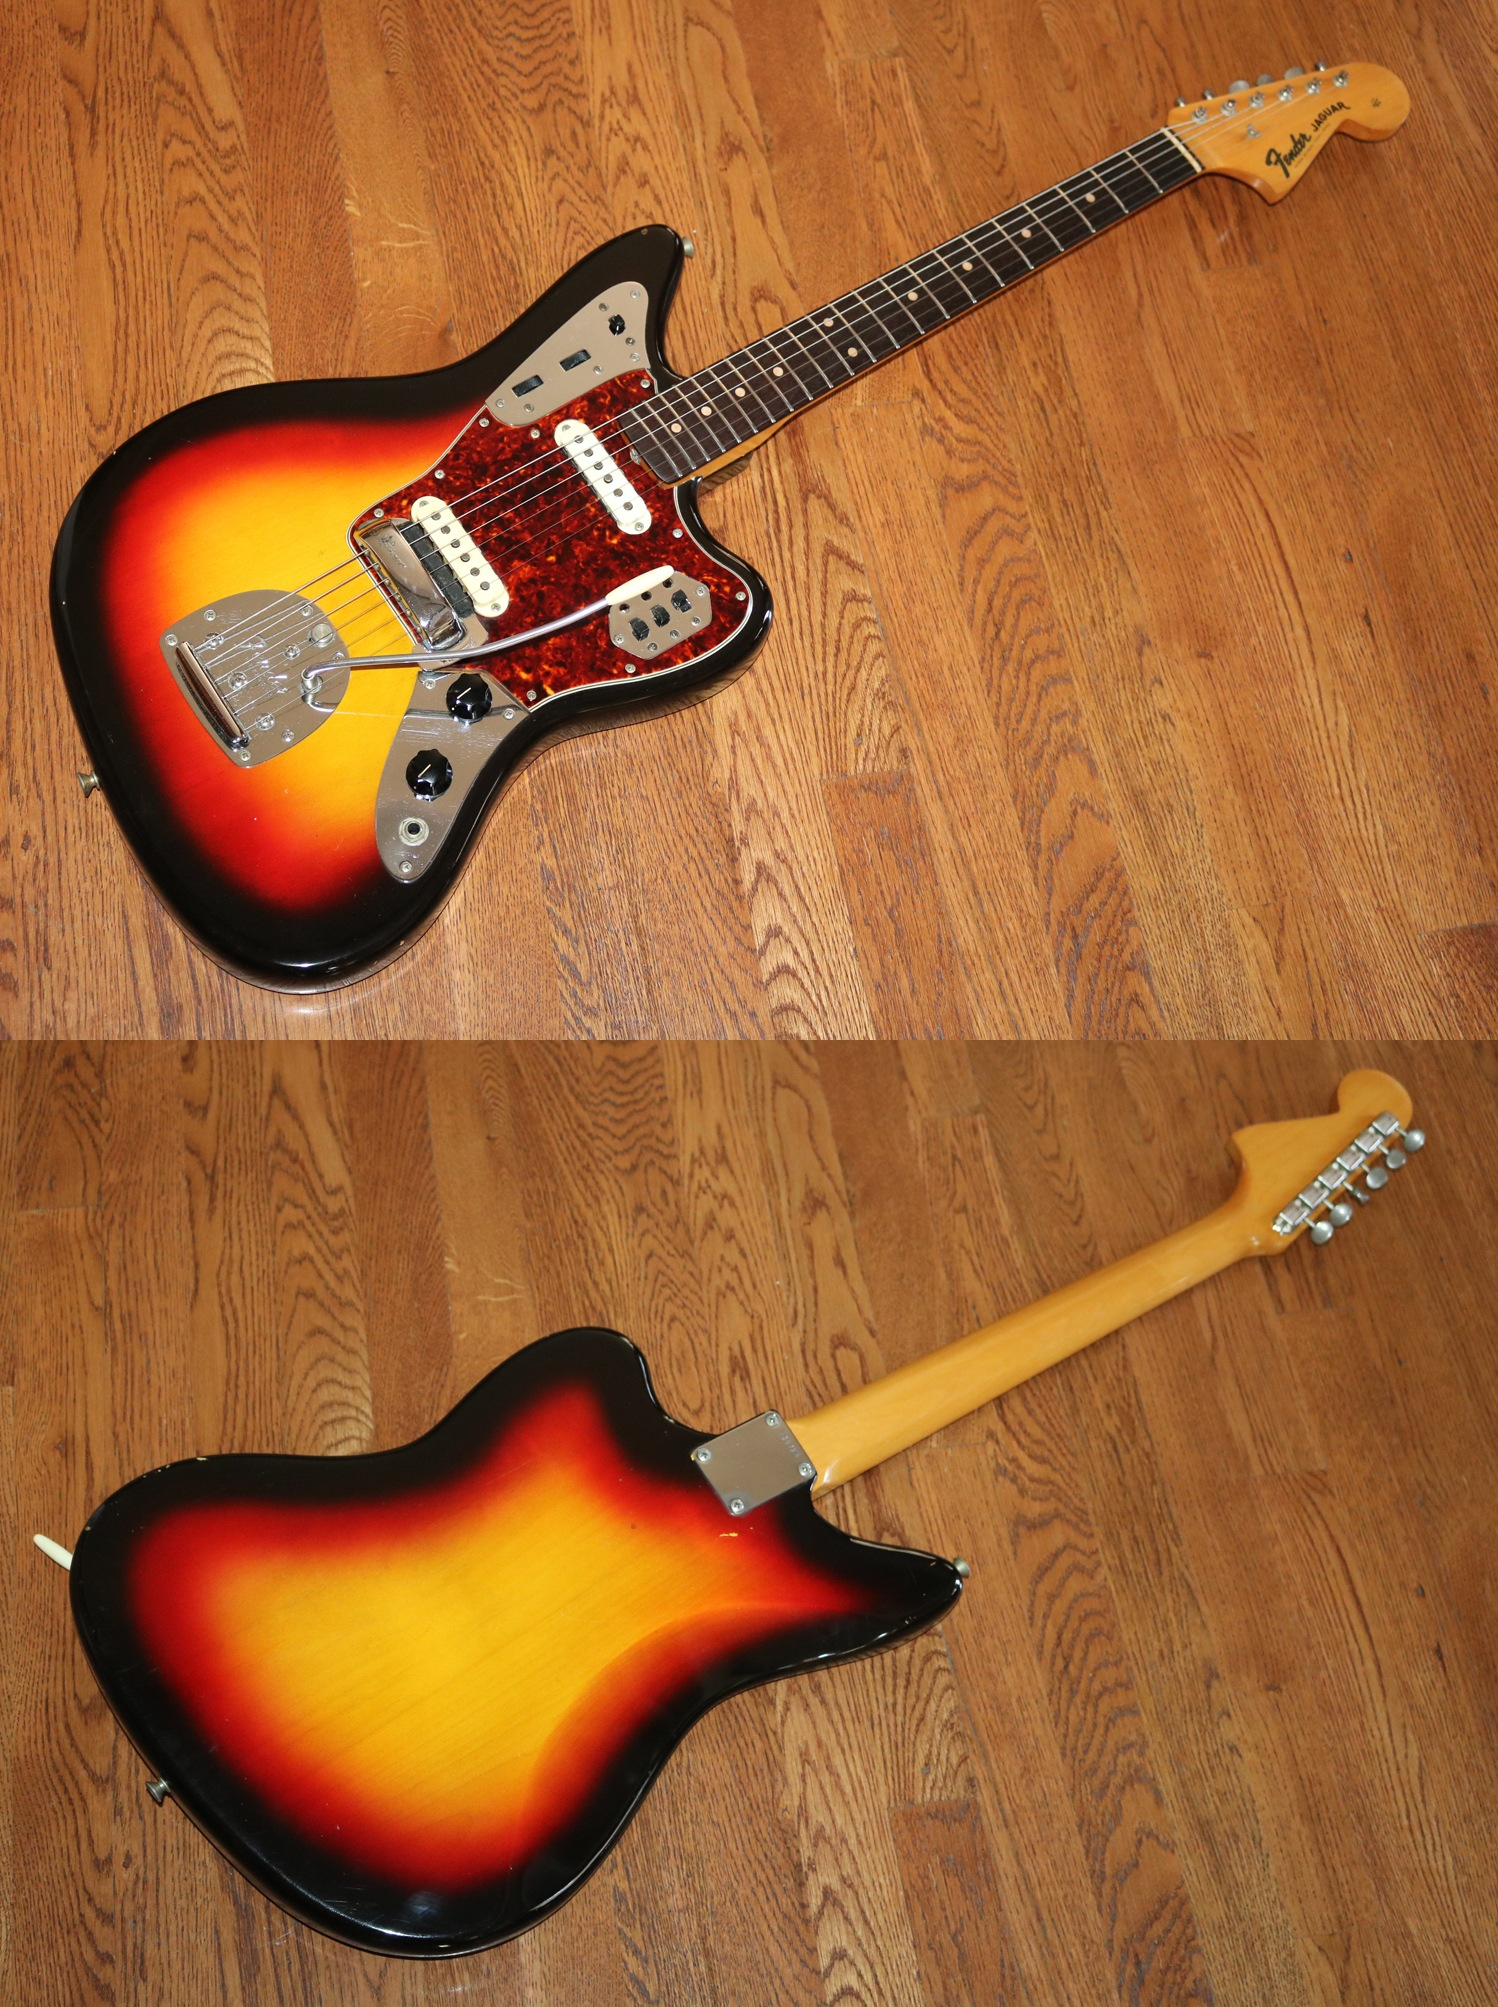 fender jaguar classic files llc garysguitars garys s catalog vintage default guitars sites com